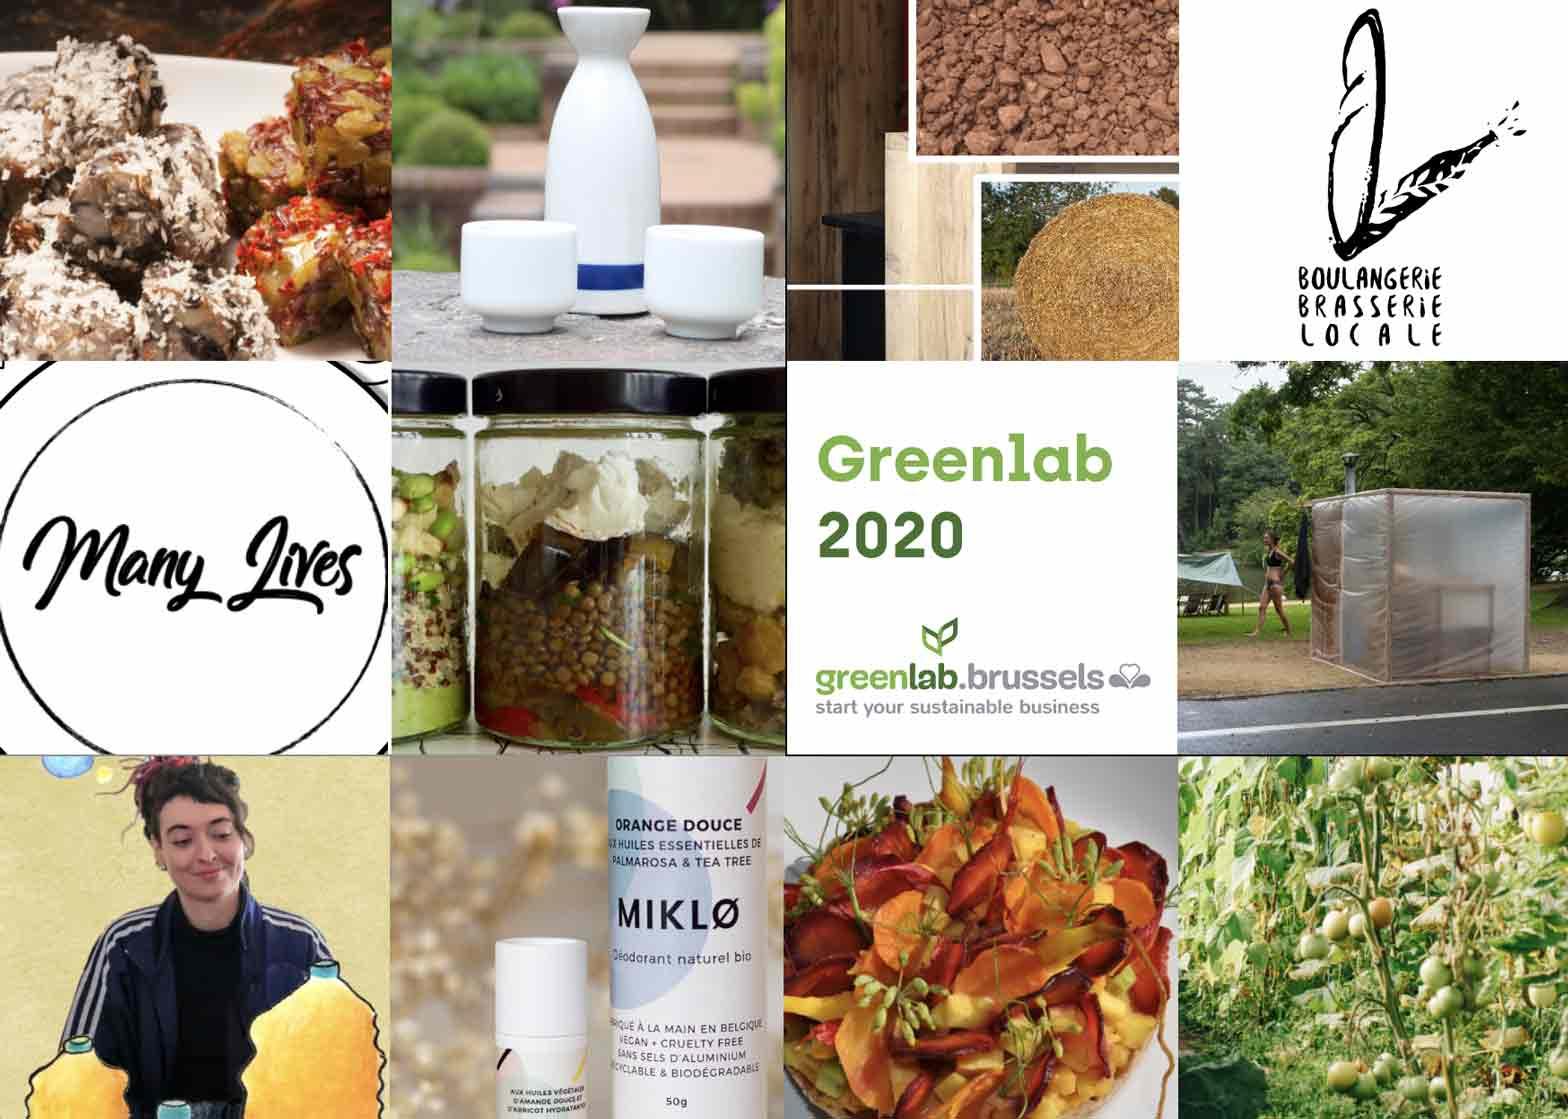 Greenlab 2020: de winnende start-ups